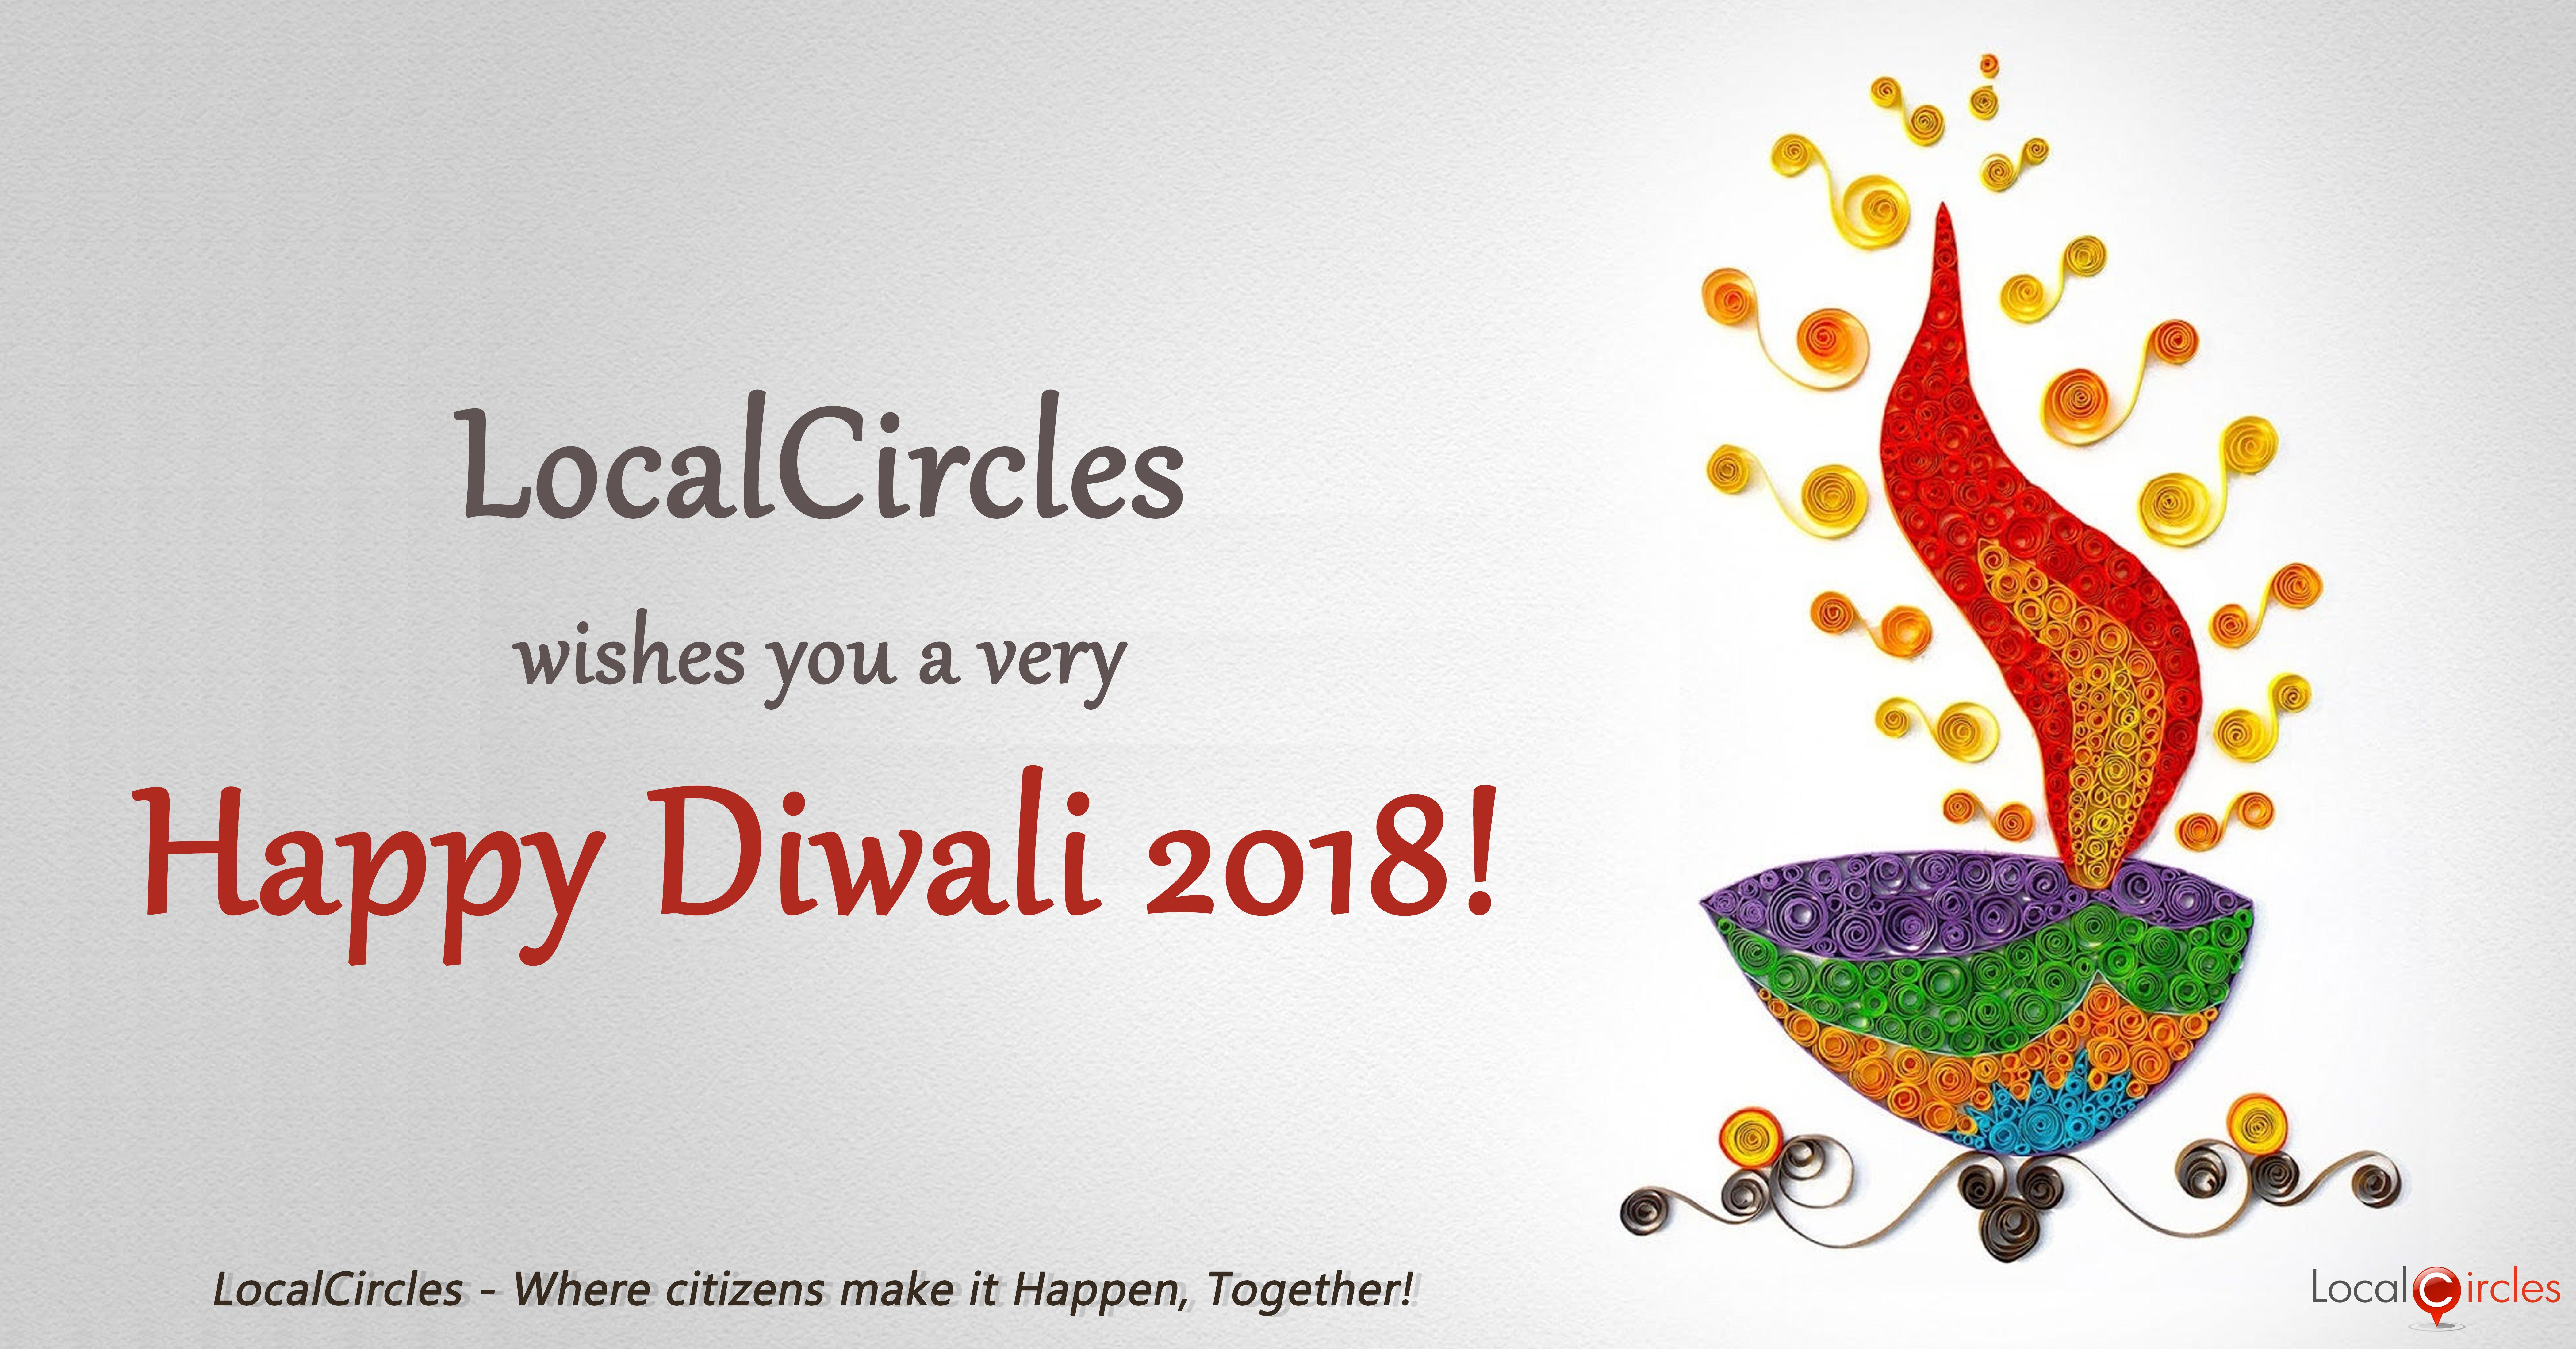 Happy_Diwali_2018_-_1_-_v2___20181107125352___.jpg